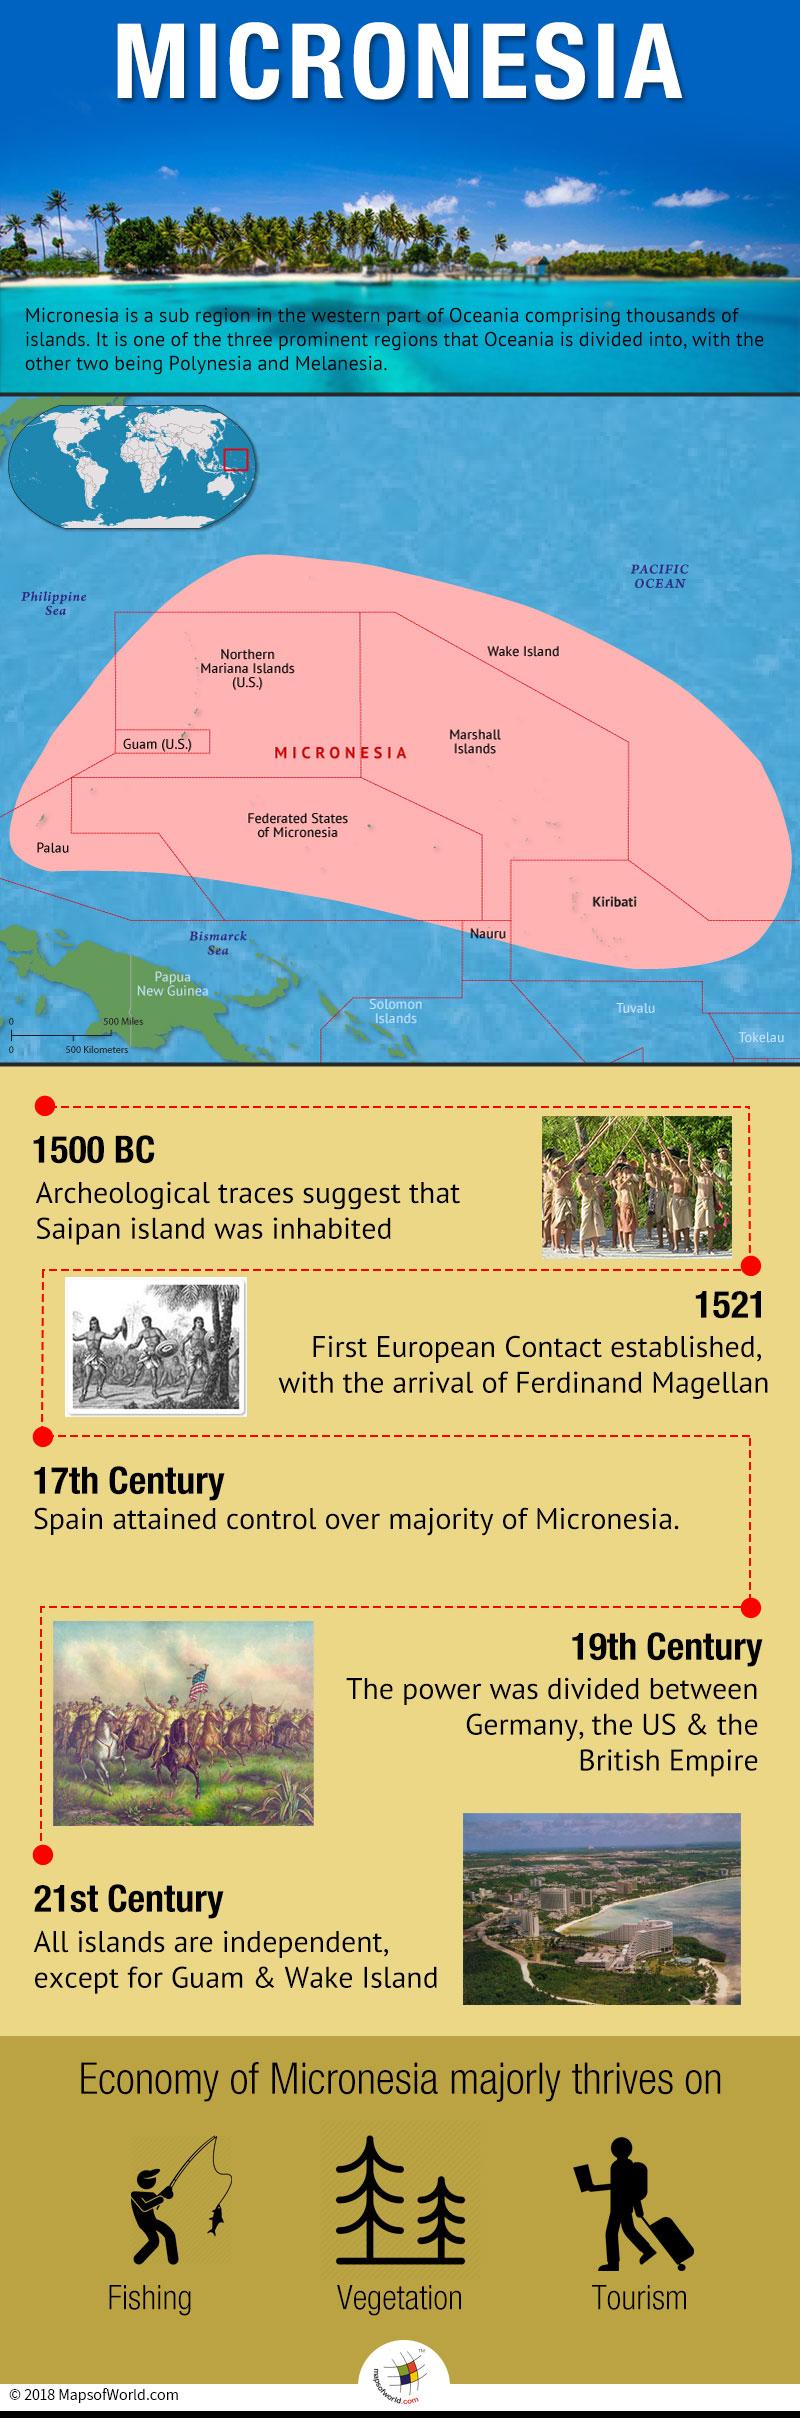 Infographic elaborating Micronesia